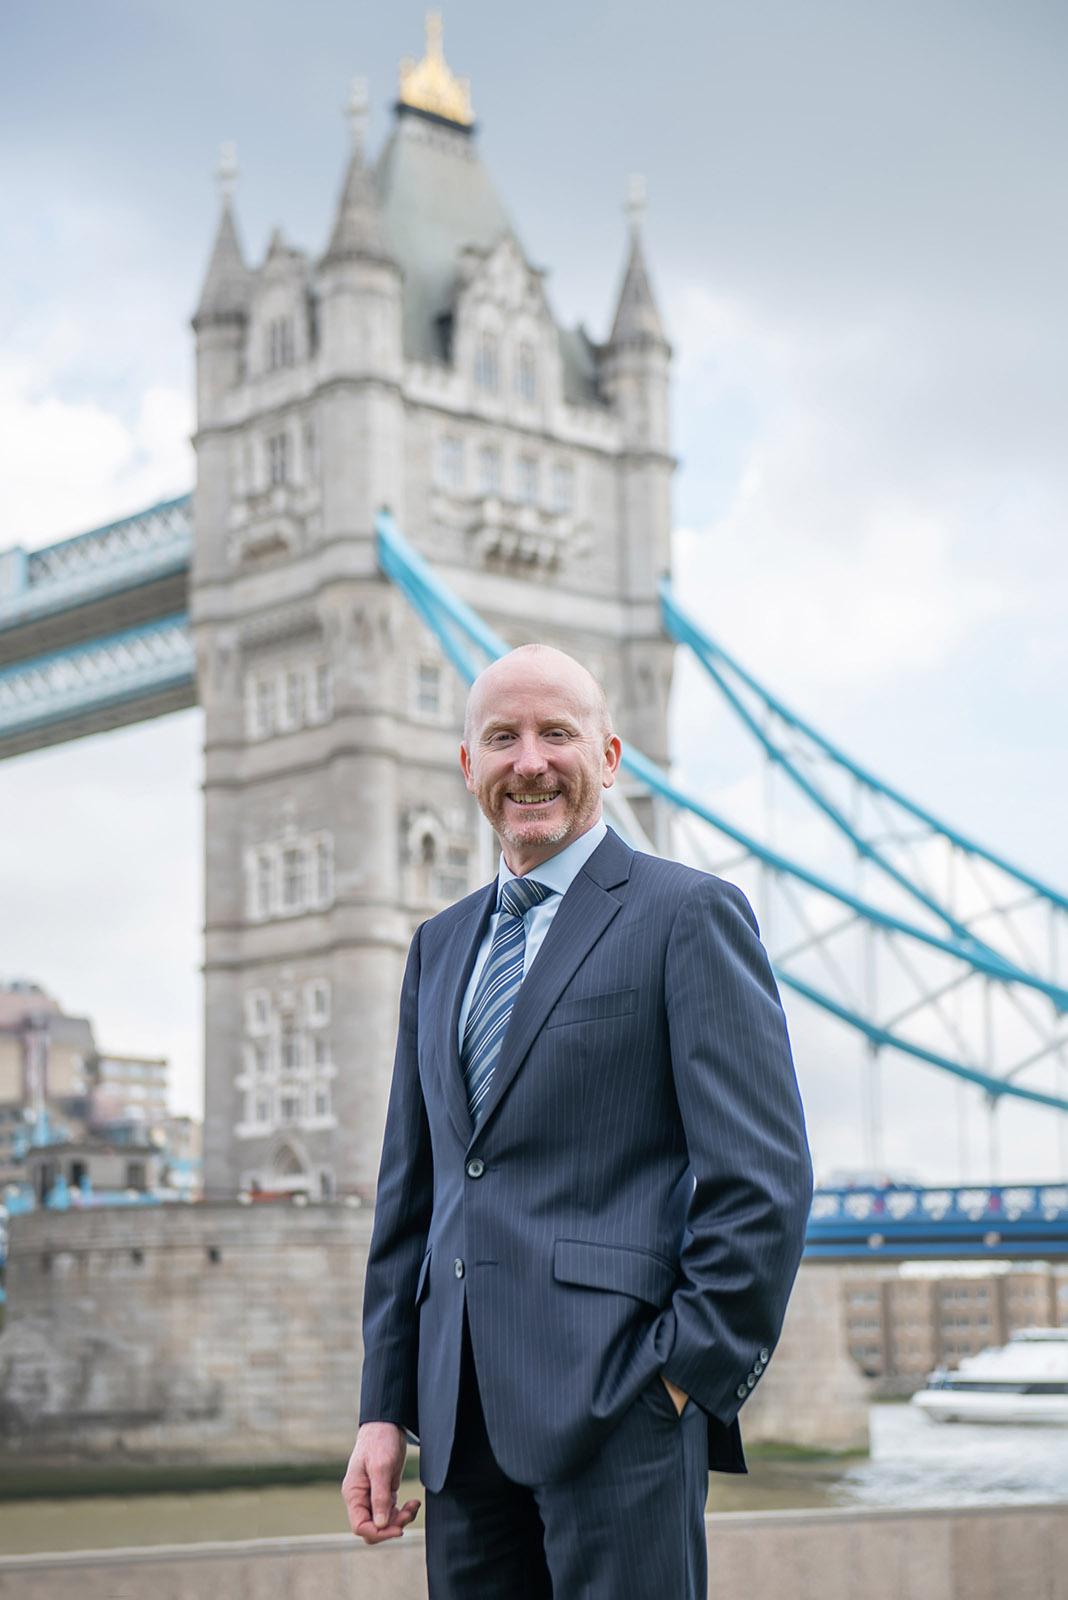 London Bridge Business Portraits and Head-Shots